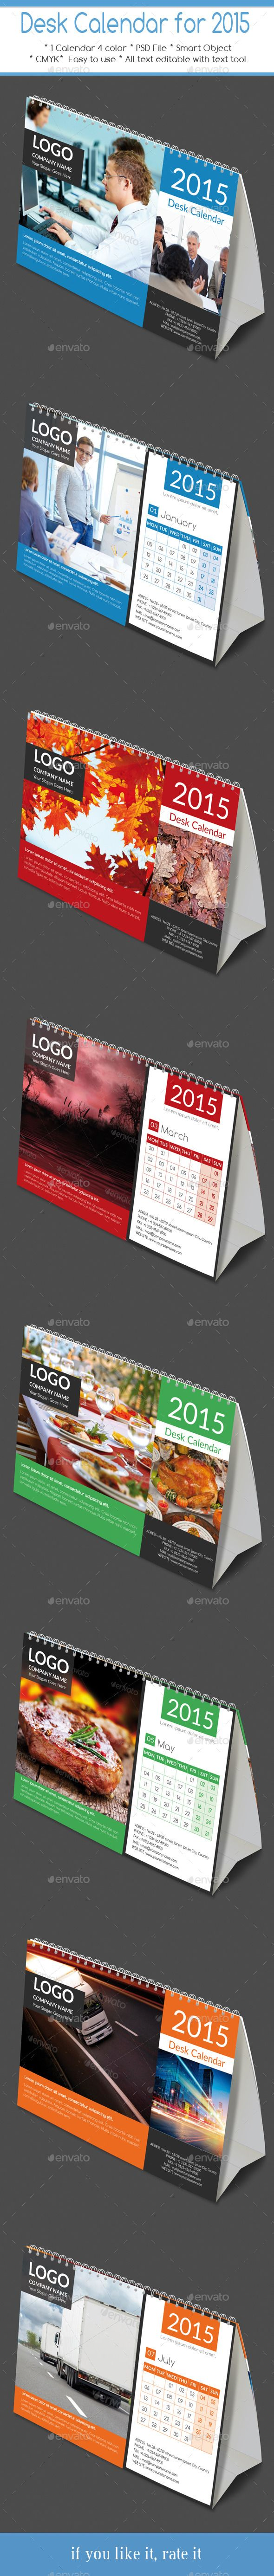 Desk Calendar for 2015 ready for print - Calendars Stationery